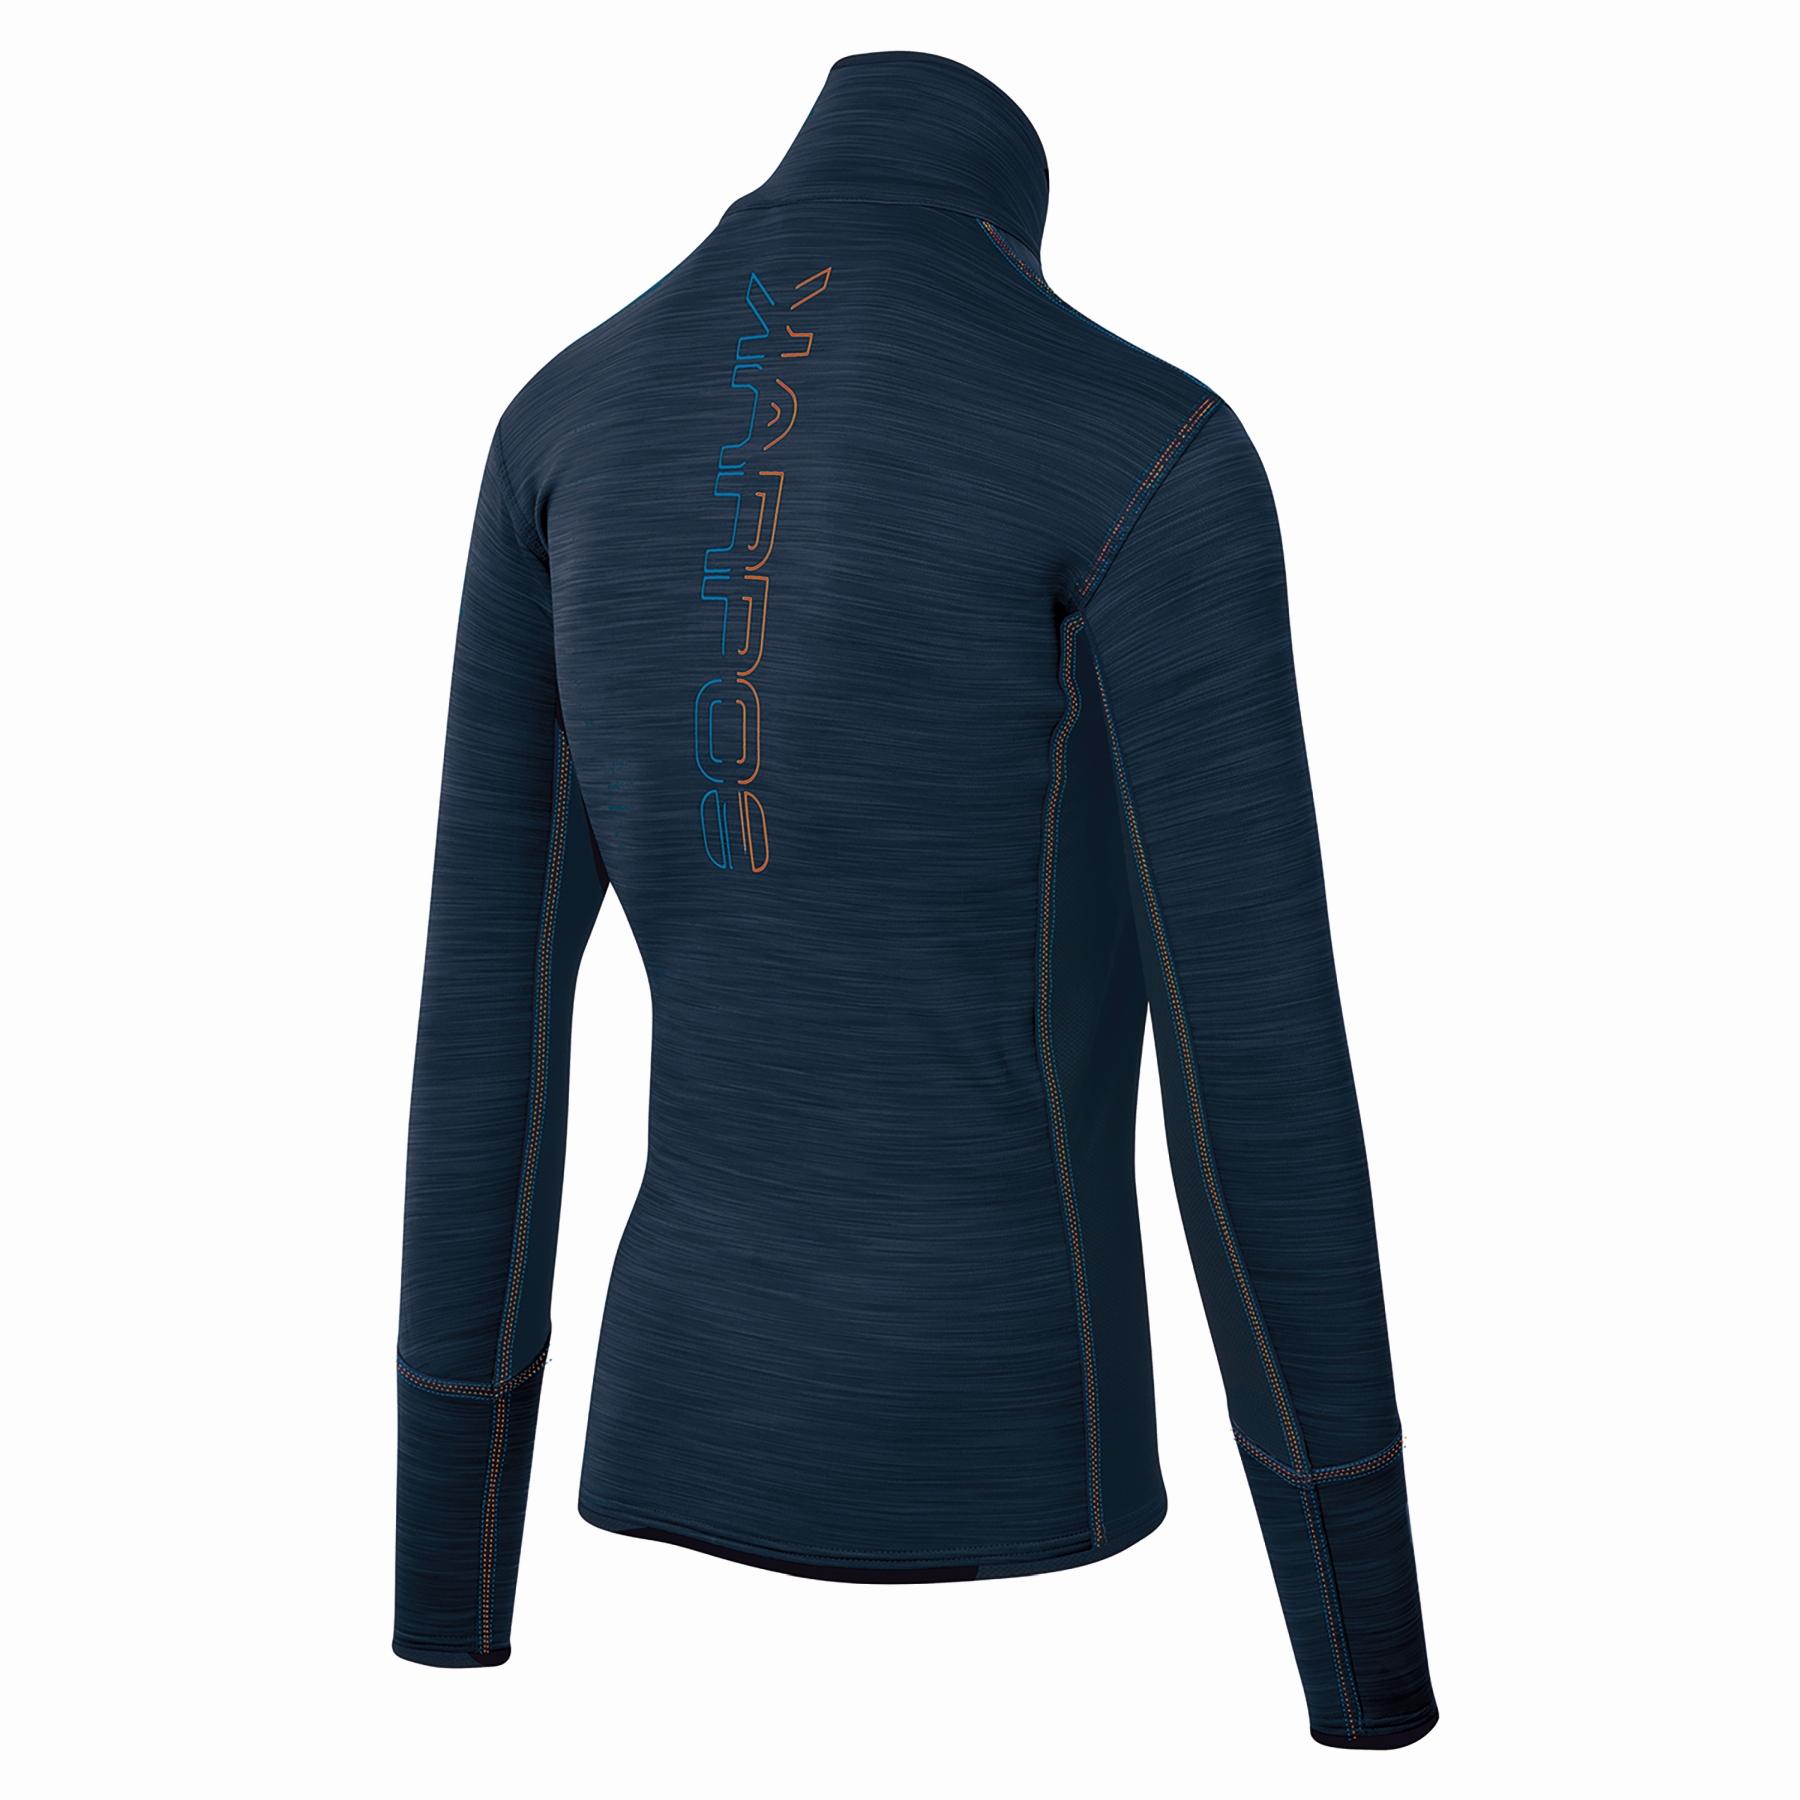 Image of Karpos Vallazza Fleece Jacket - Insignia Blue